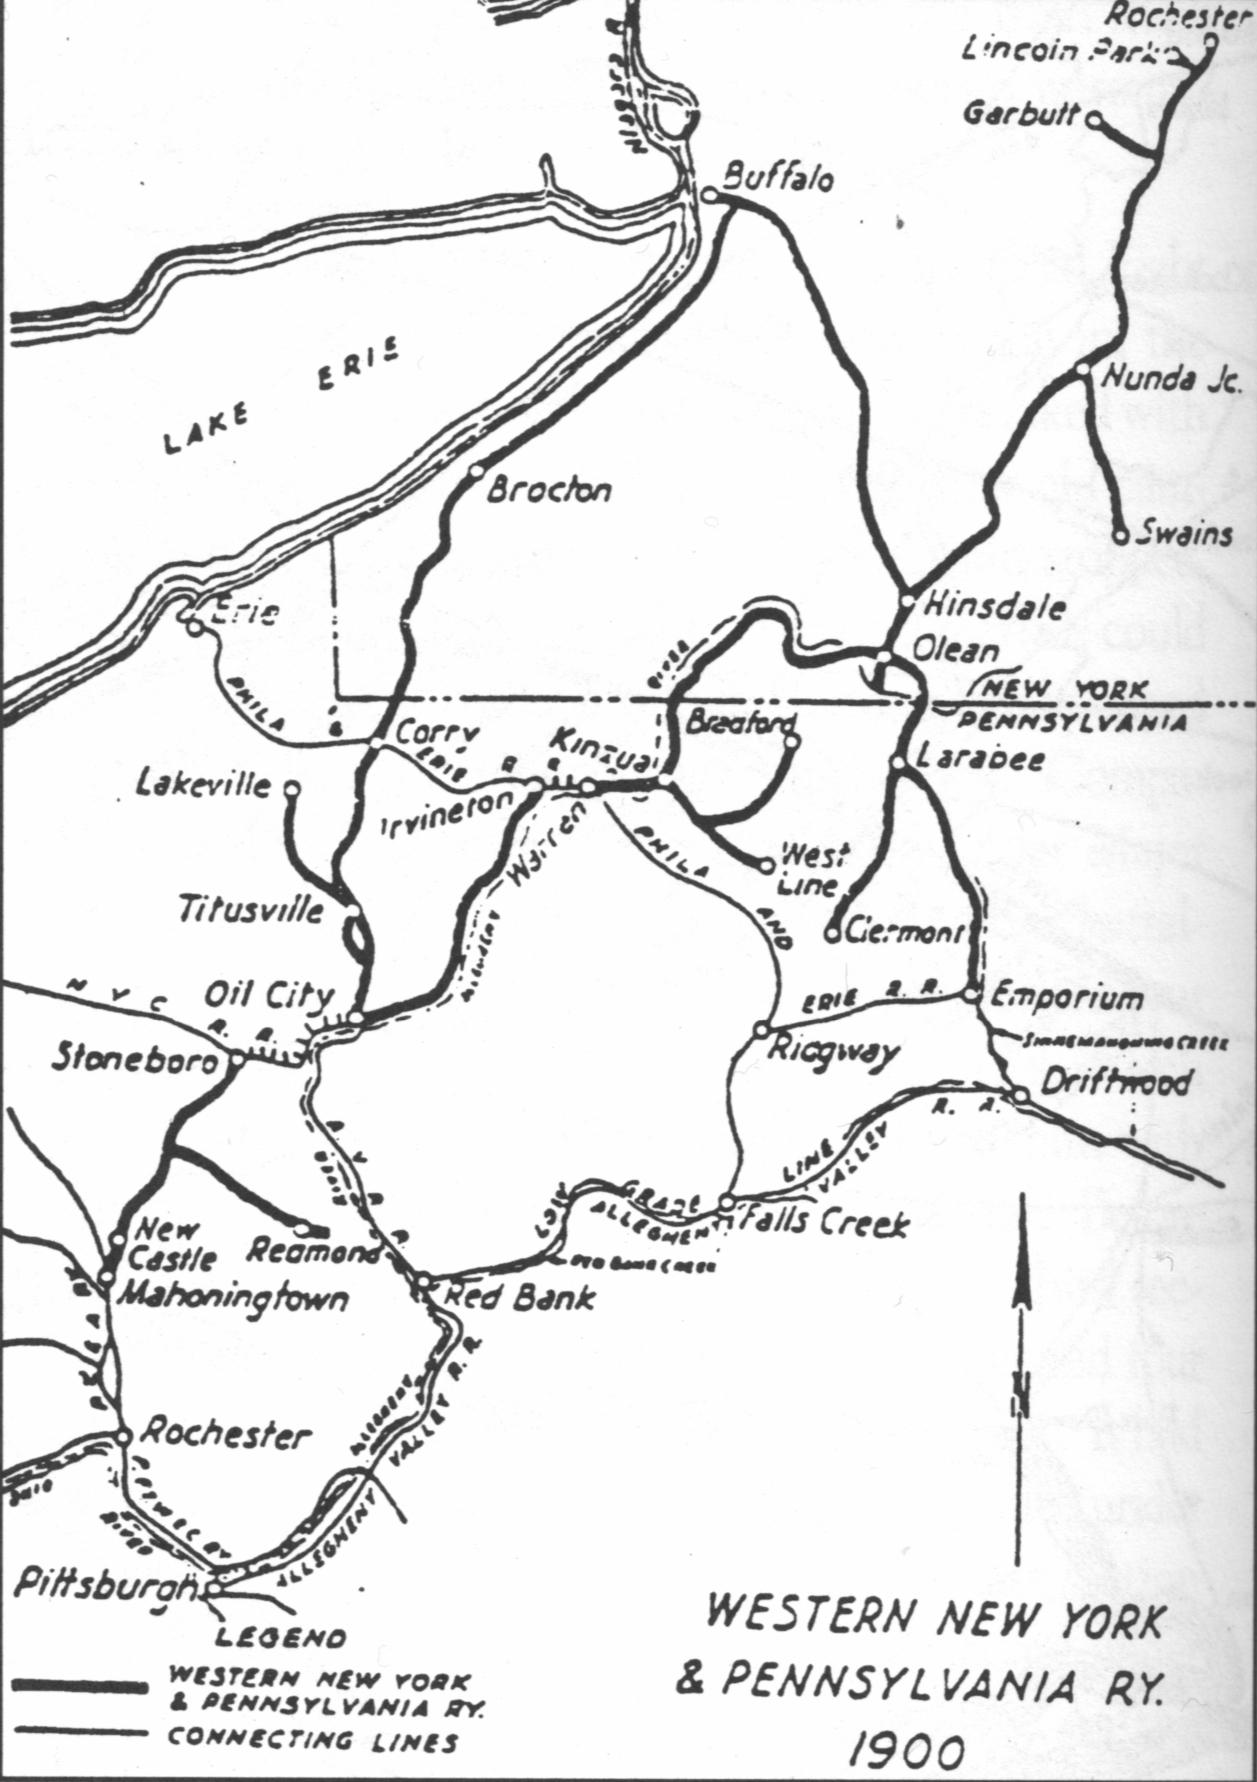 Western New York And Pennsylvania Railway